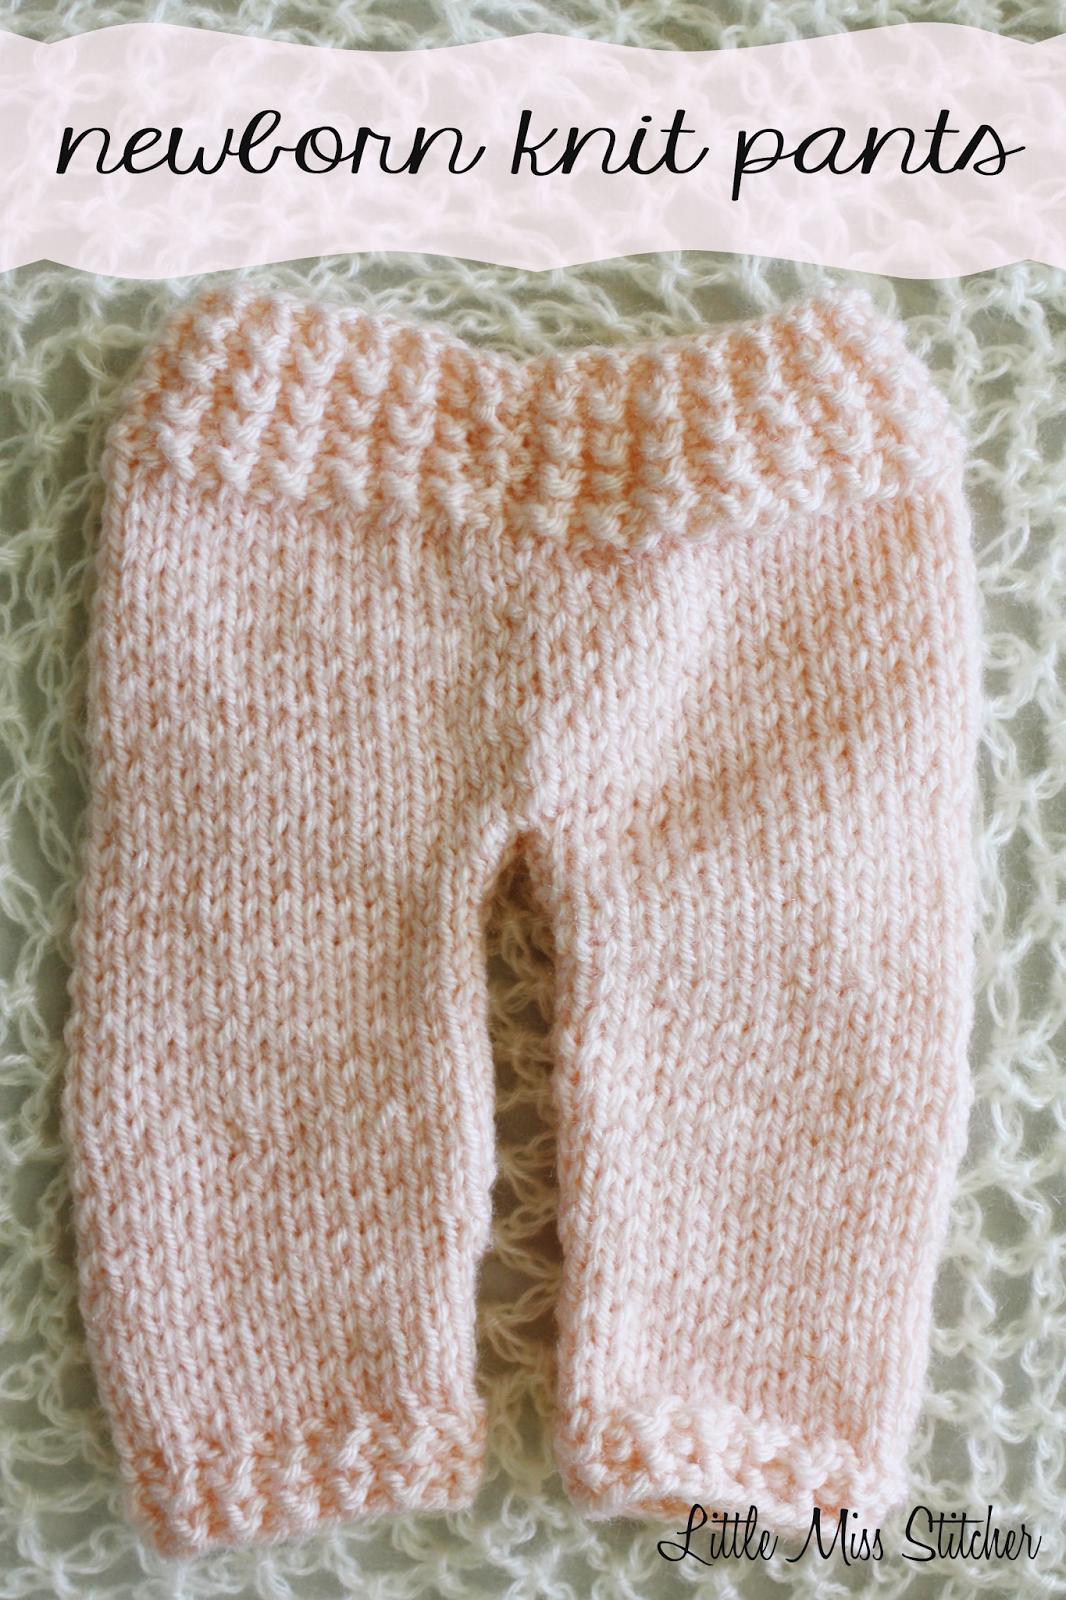 Little miss stitcher newborn knit pants free pattern knit little miss stitcher newborn knit pants free pattern bankloansurffo Gallery